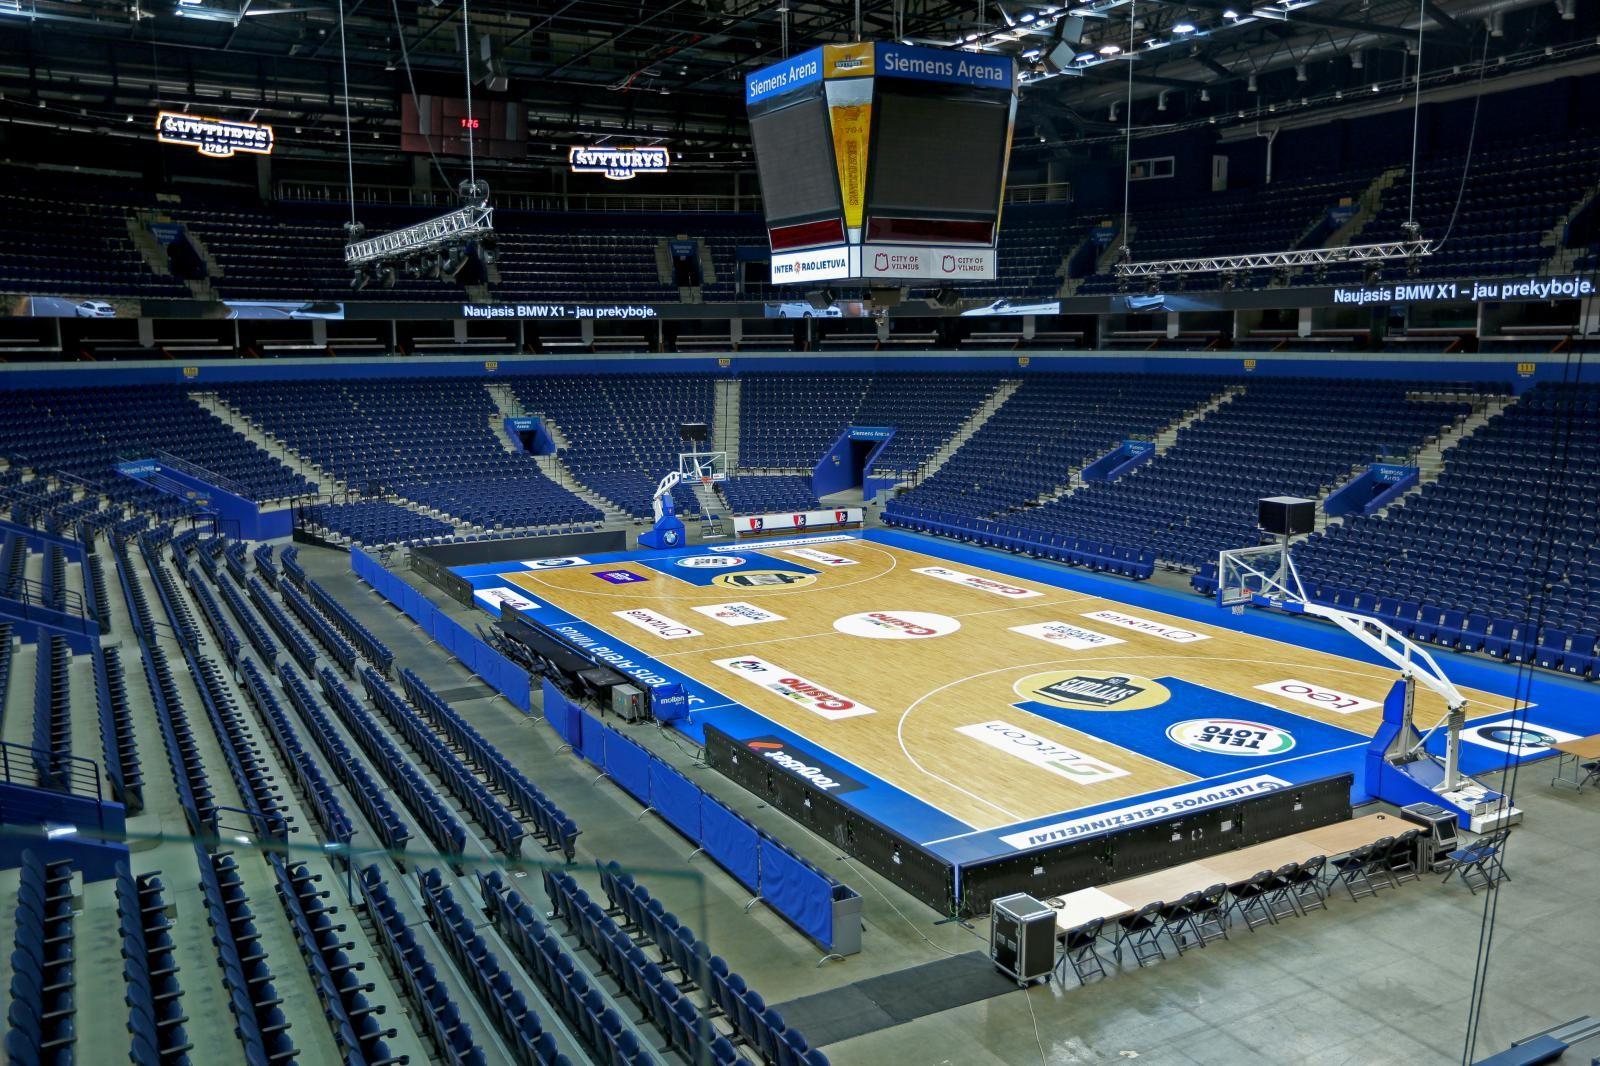 Event suite | Siemens arena